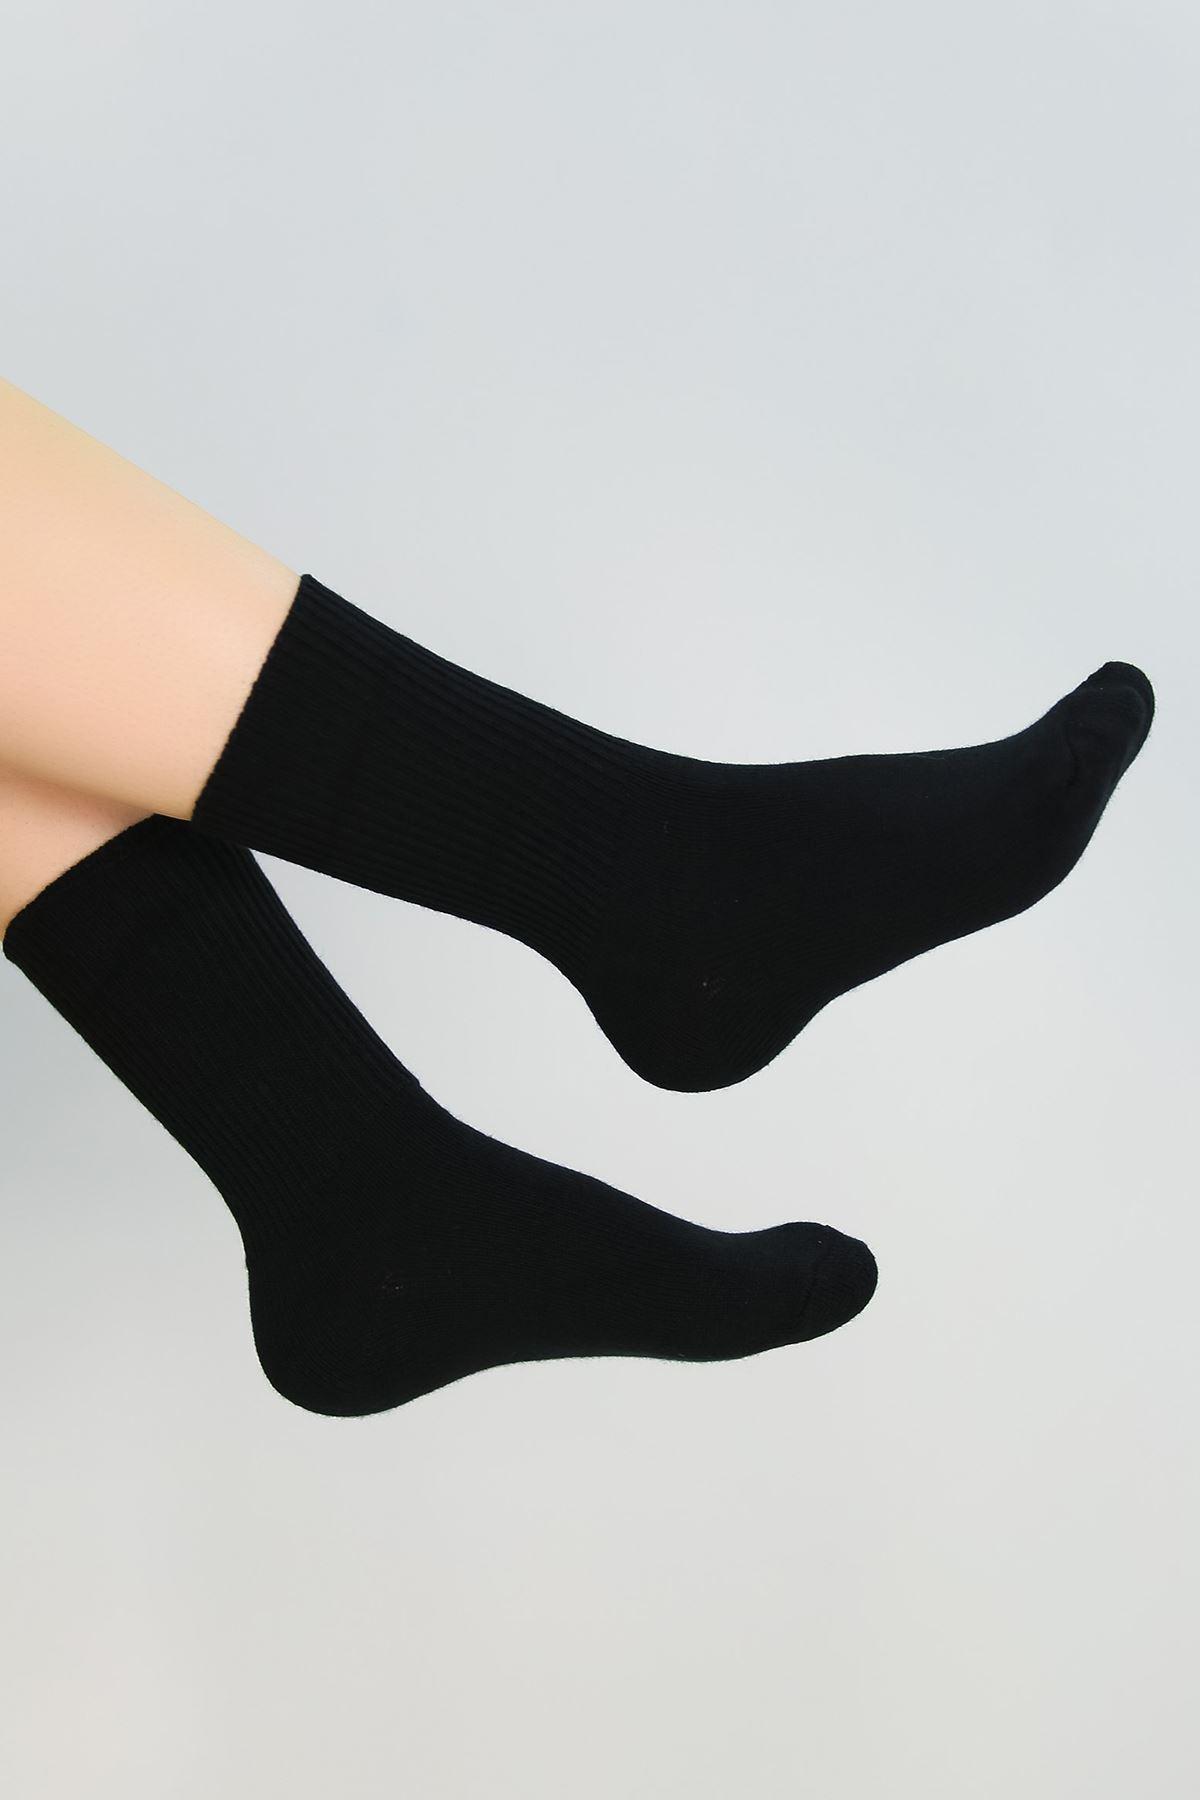 Bayan Bot Çorabı Siyah - 48100.1114.